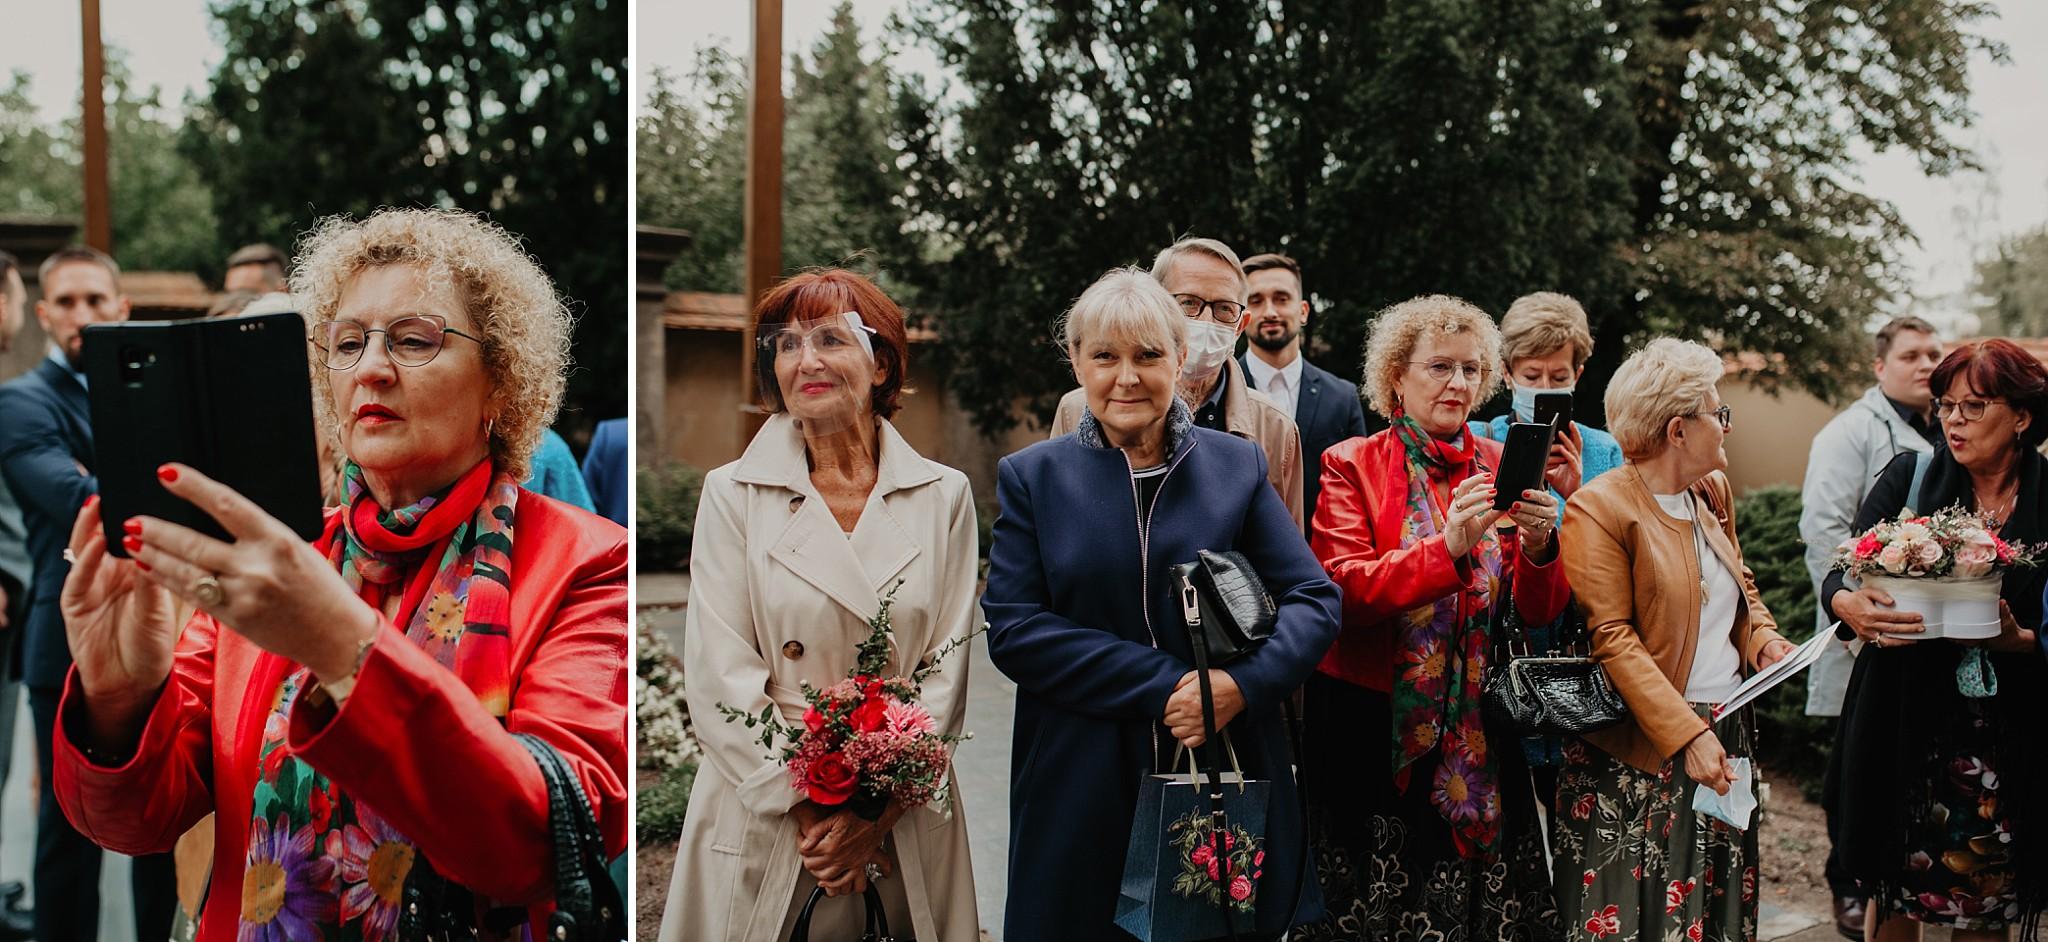 fotograf poznan wesele dobra truskawka piekne wesele pod poznaniem wesele w dobrej truskawce piekna para mloda slub marzen slub koronawirus slub listopad wesele koronawirus 234